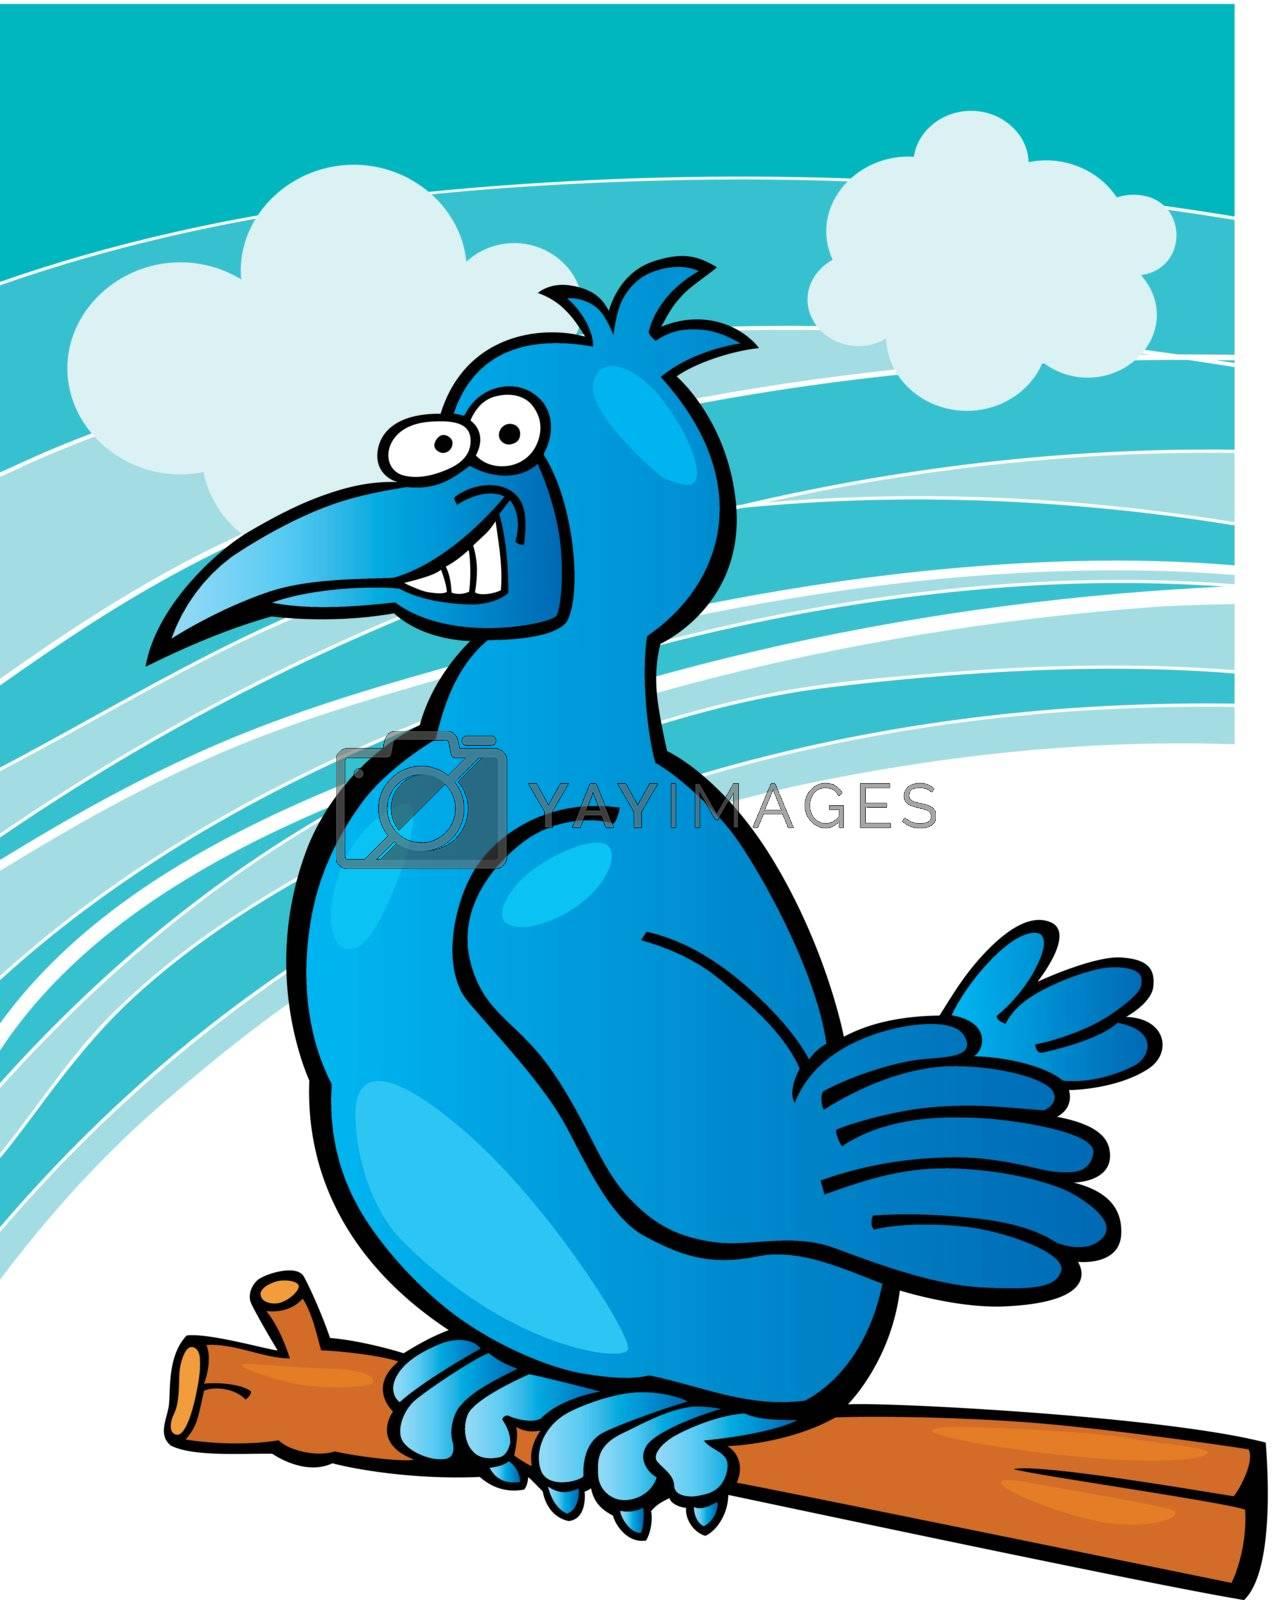 Royalty free image of blue bird by izakowski